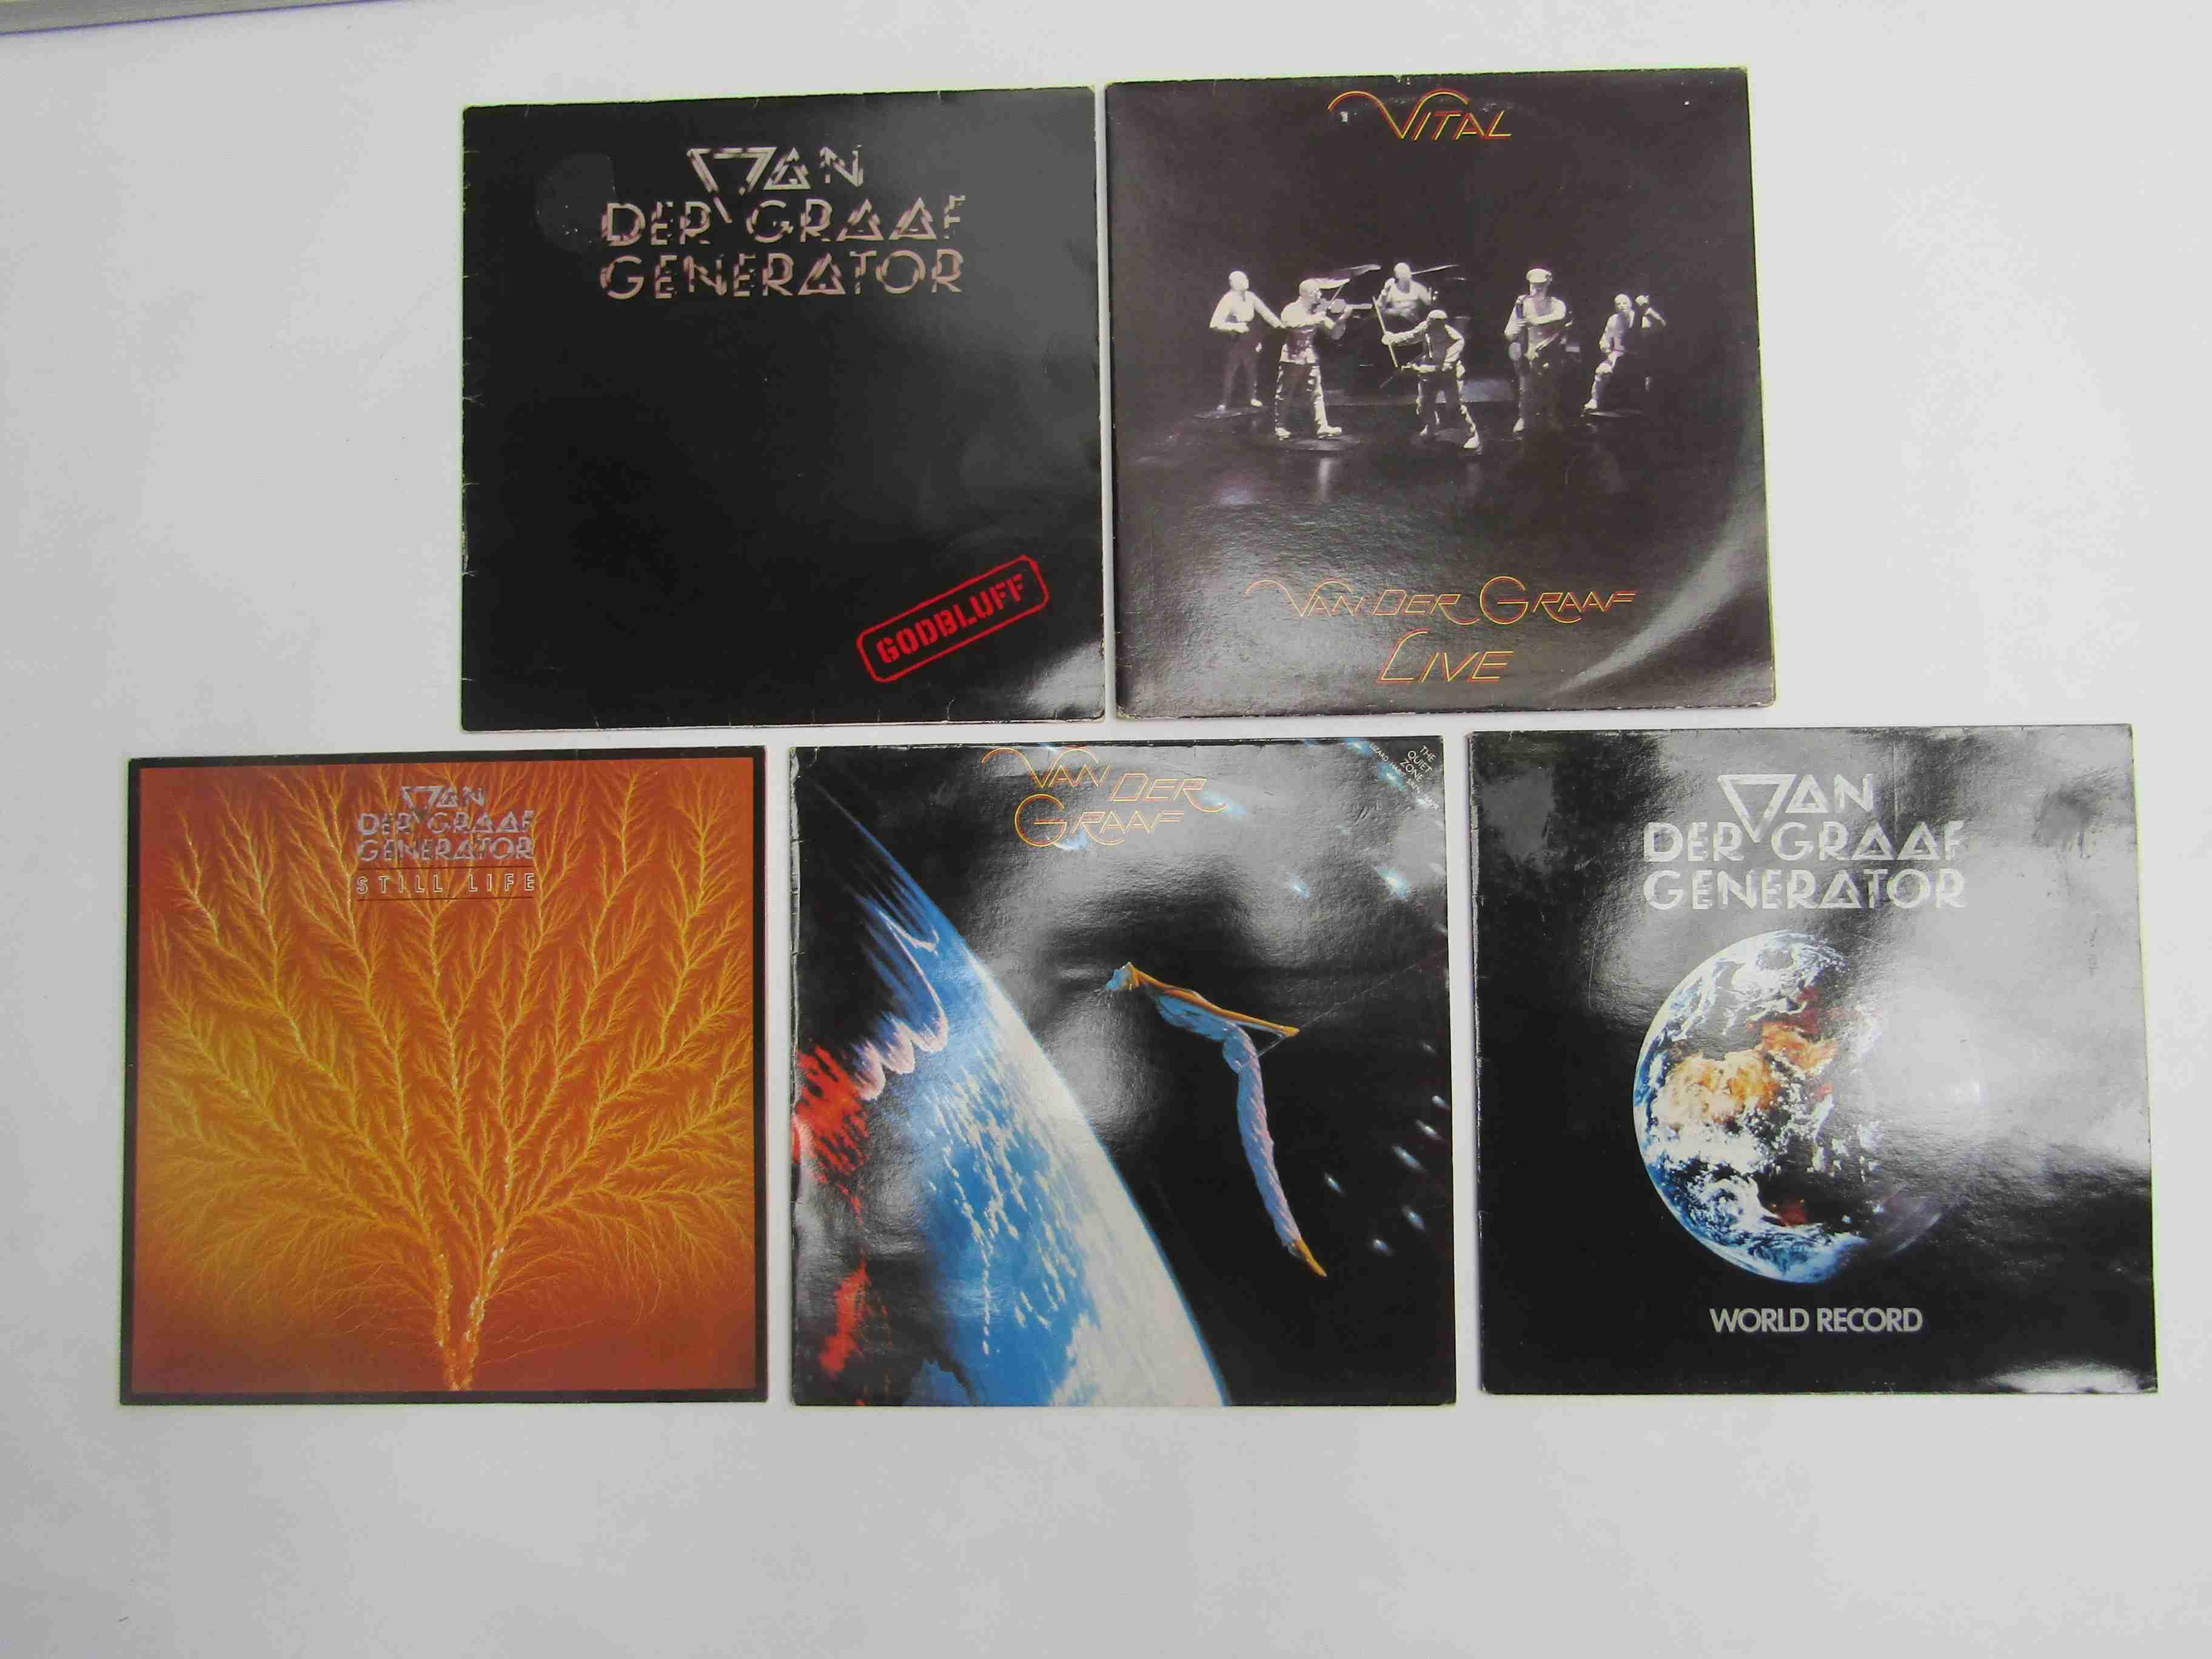 VAN DER GRAAF GENERATOR: Five LP's including 'Godbluff', 'Still Life', 'World Record',